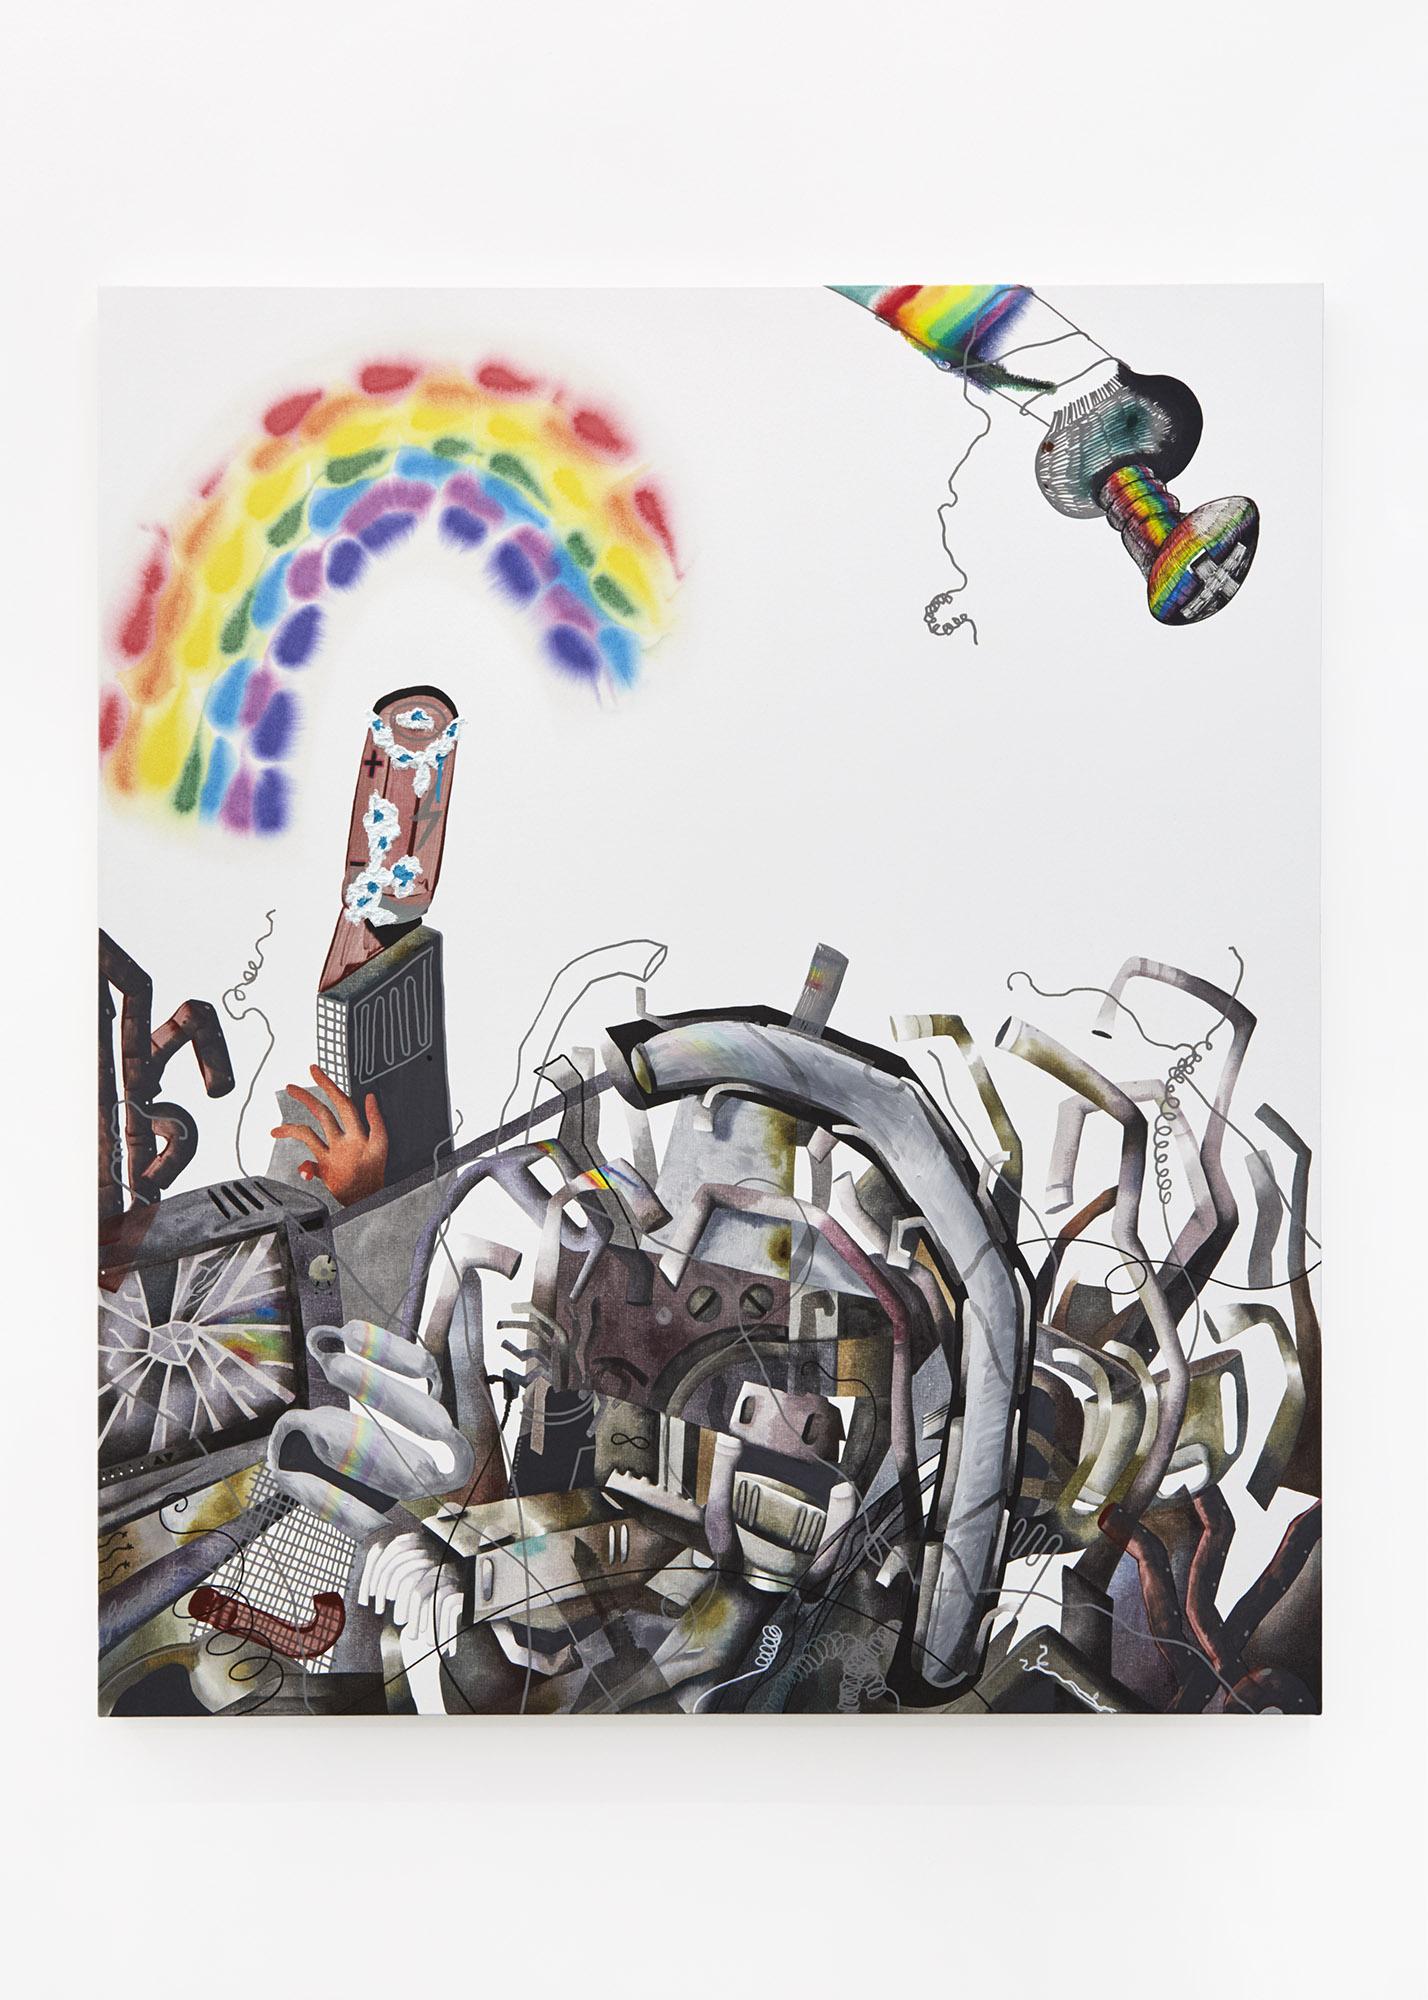 Waste Acrylic on canvas 140 x 120cm, 2018